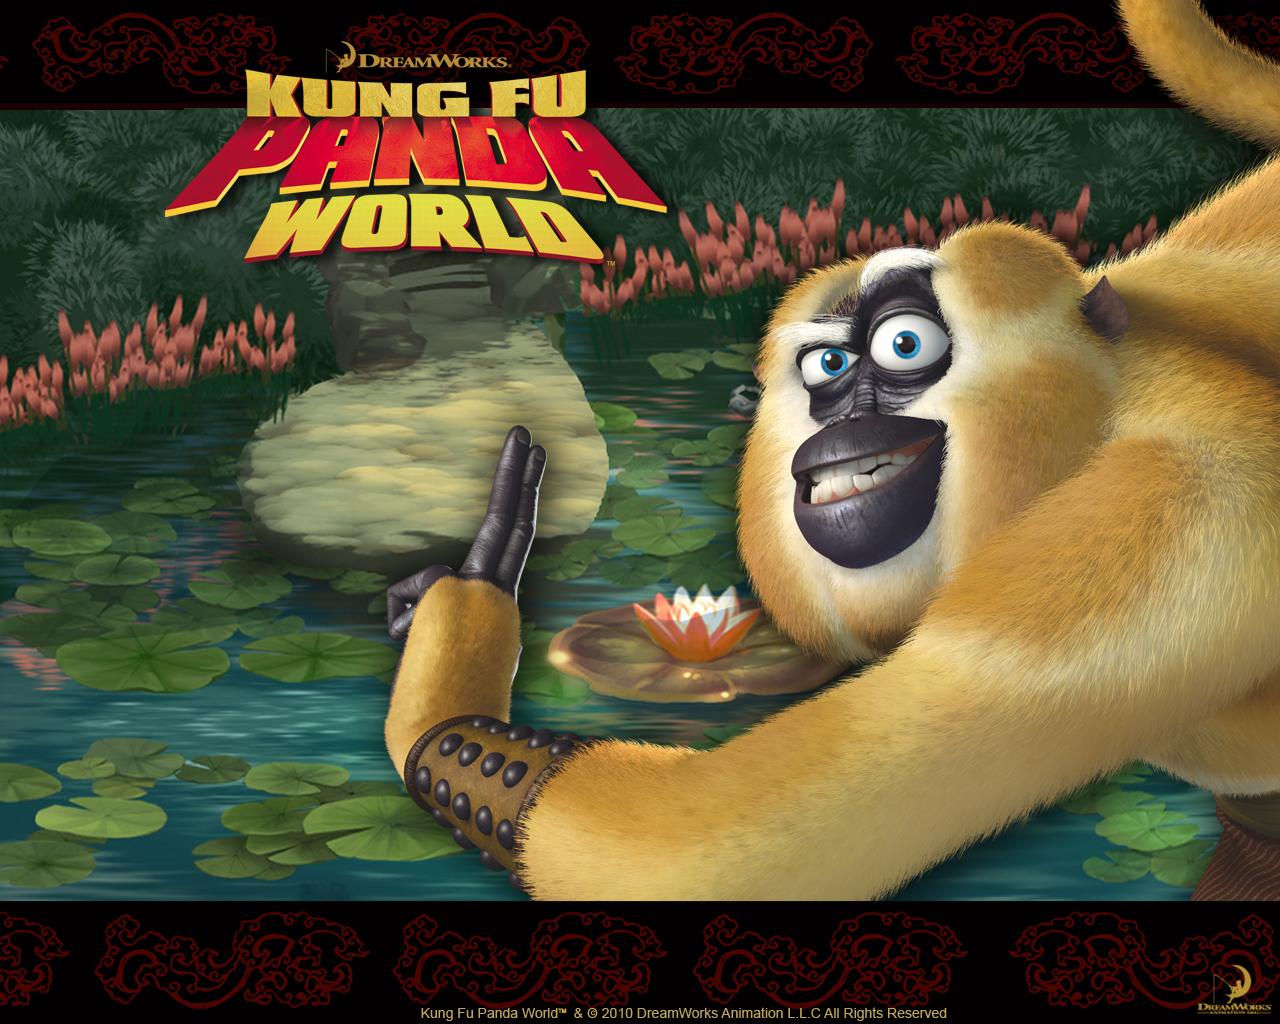 kung fu panda 2 hd trailers and kung fu panda 2 wallpapers - blu-ray